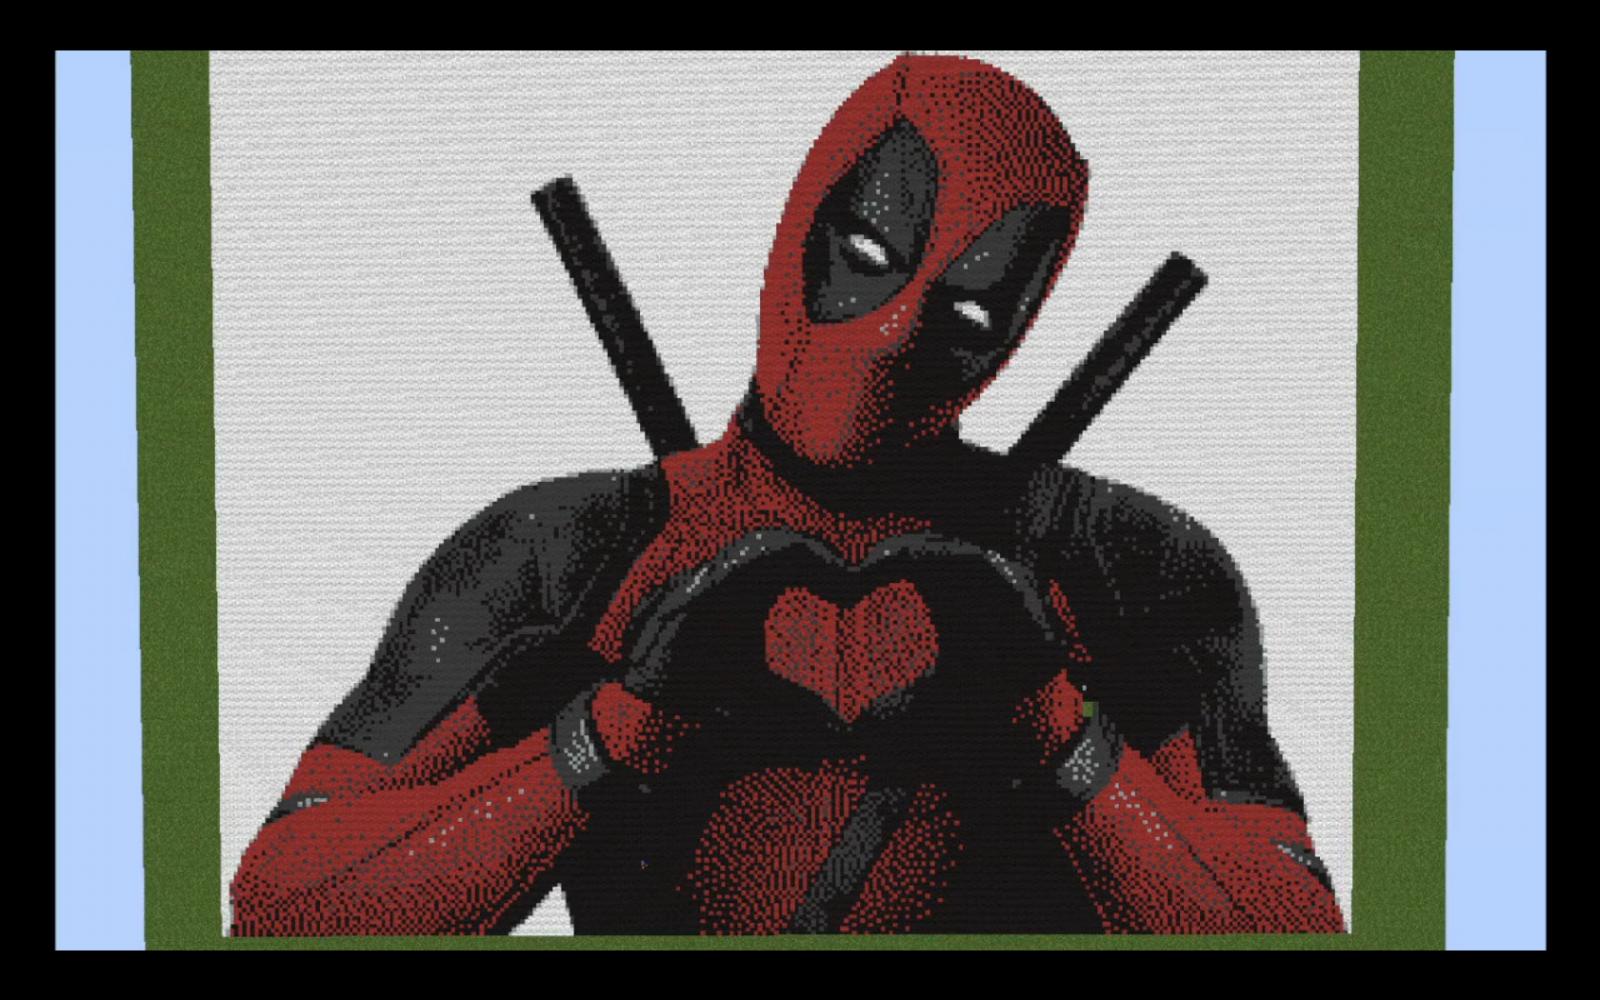 Pixilart Deadpool Pixel Art By Spenceman2002